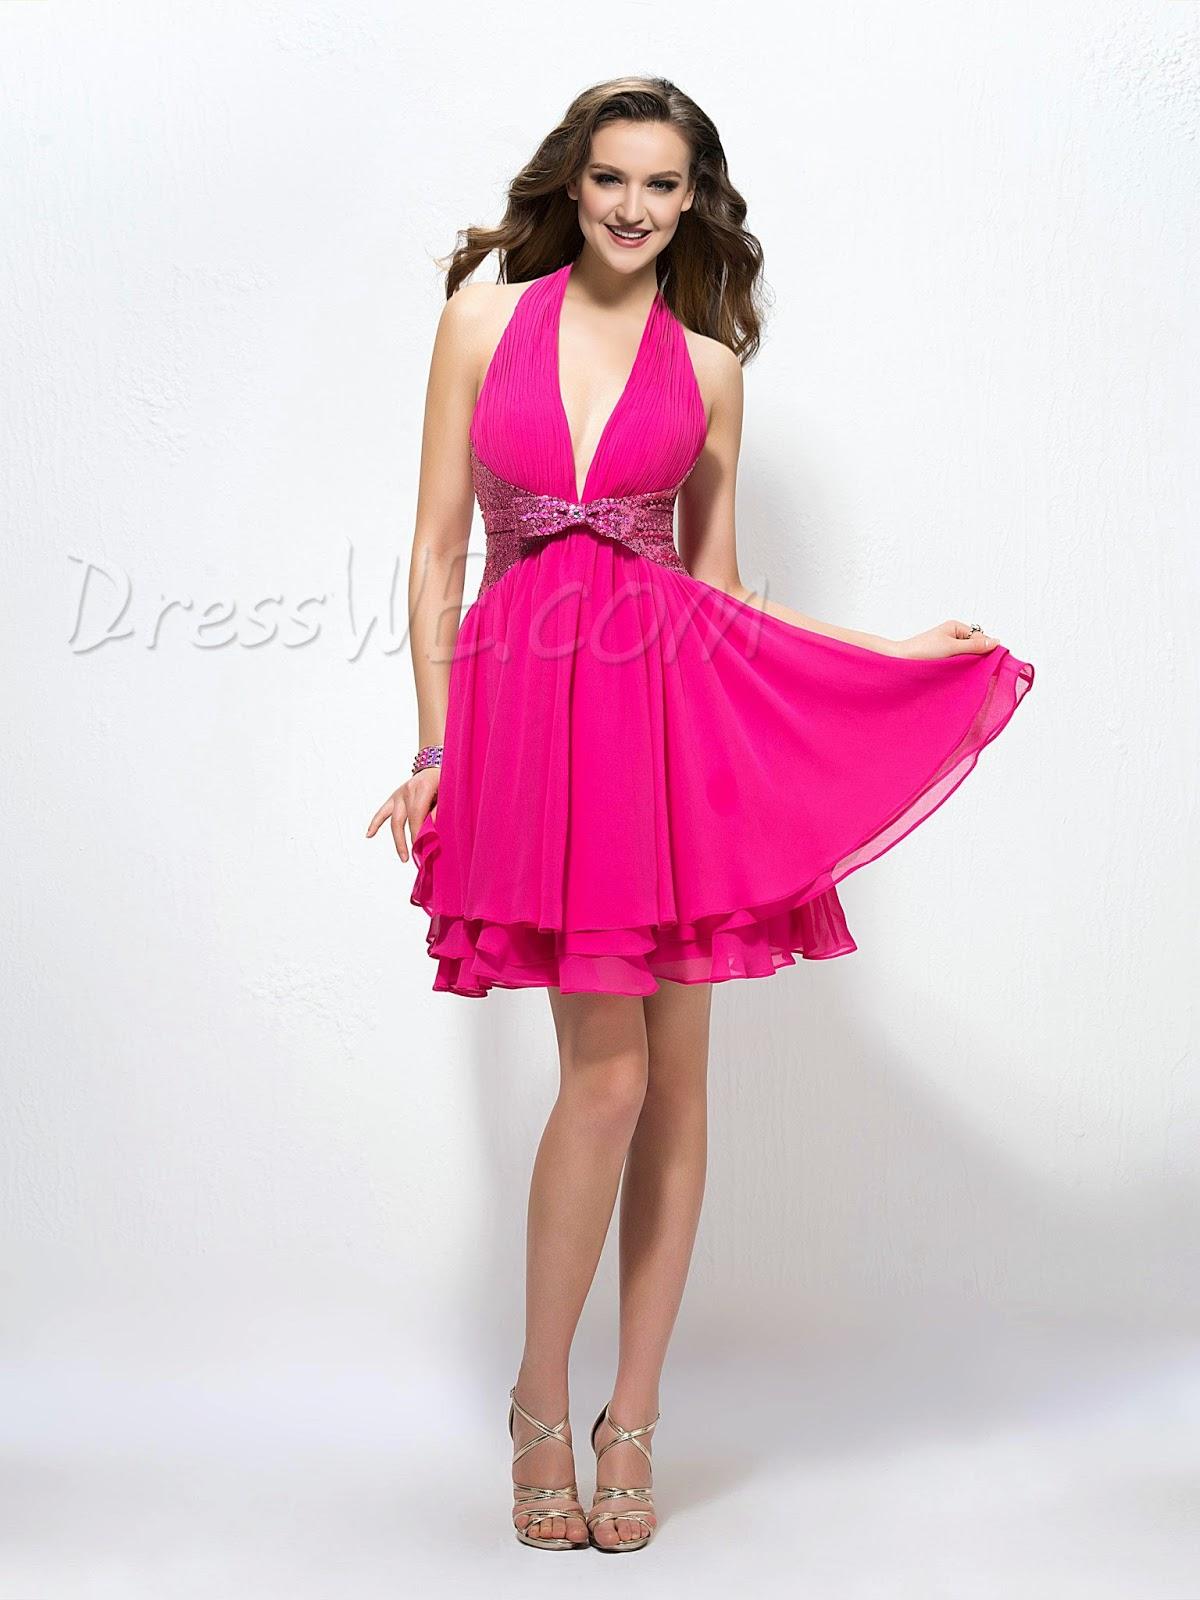 http://www.dresswe.com/item/10891363.html